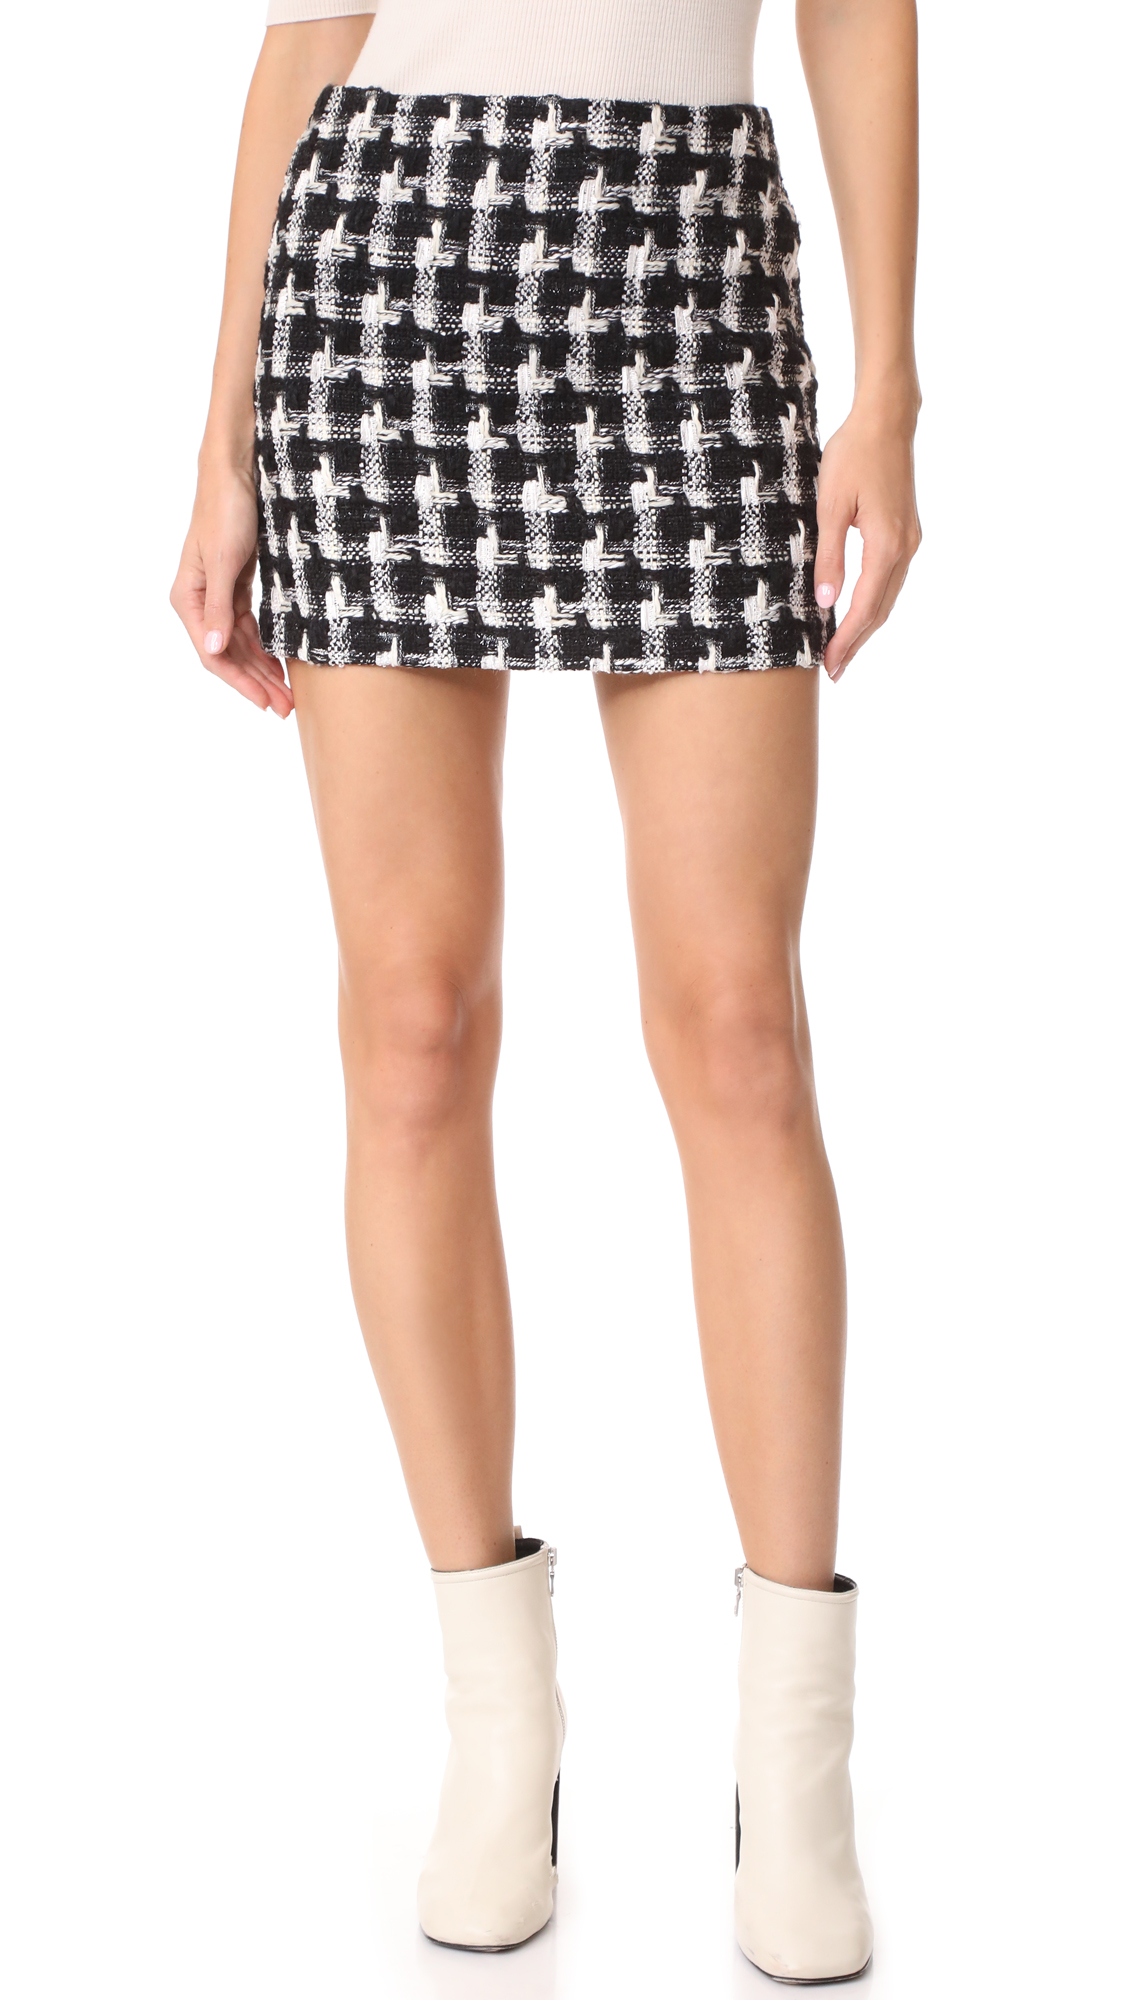 alice + olivia Elana Miniskirt - Black/White